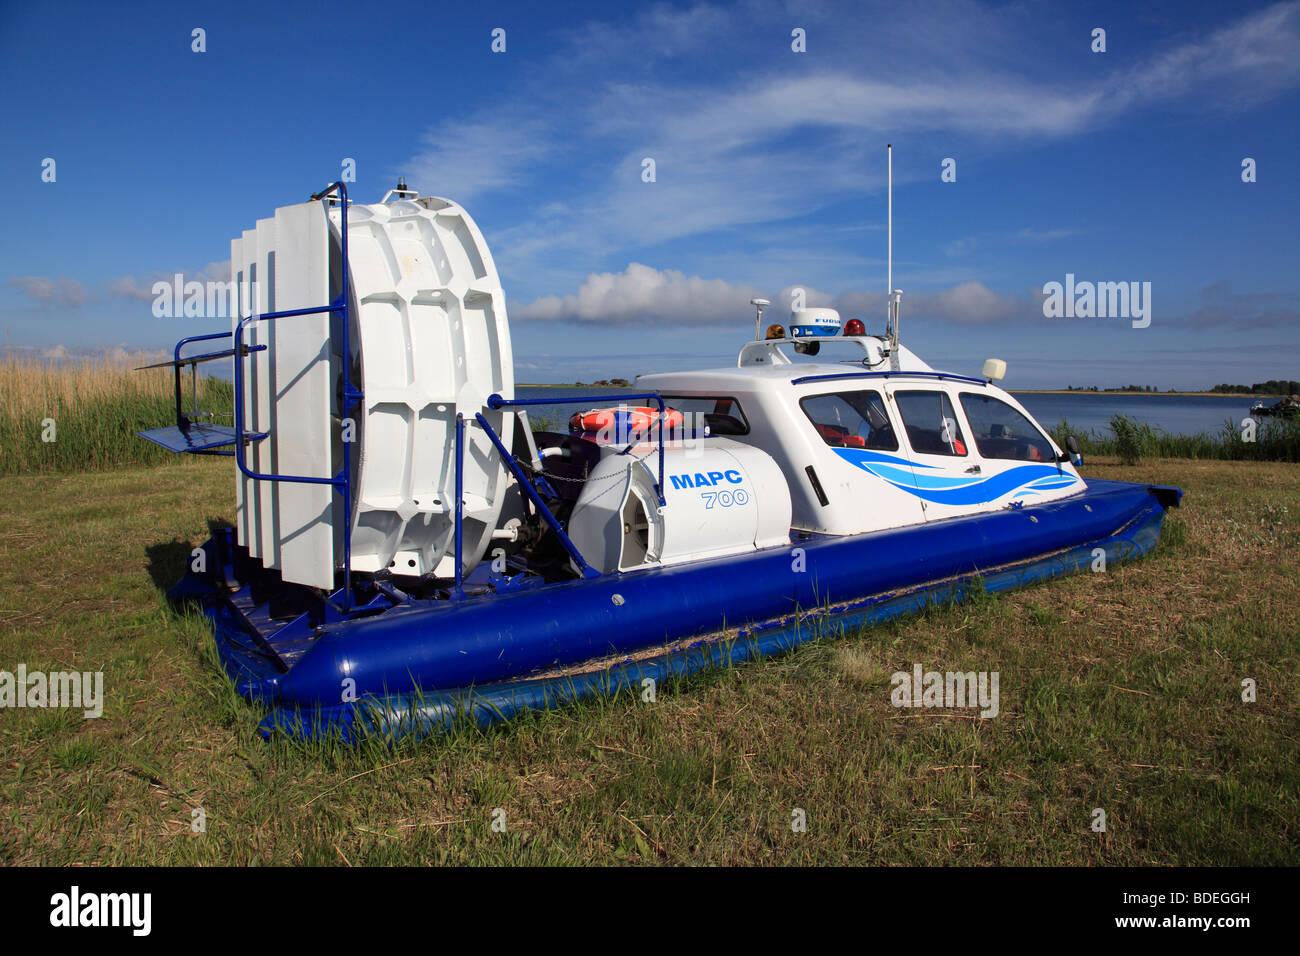 hovercraft  at the port Munalaiu near Paernu, Estonia, Baltic Nation, Eastern Europe.Photo by Willy Matheisl - Stock Image